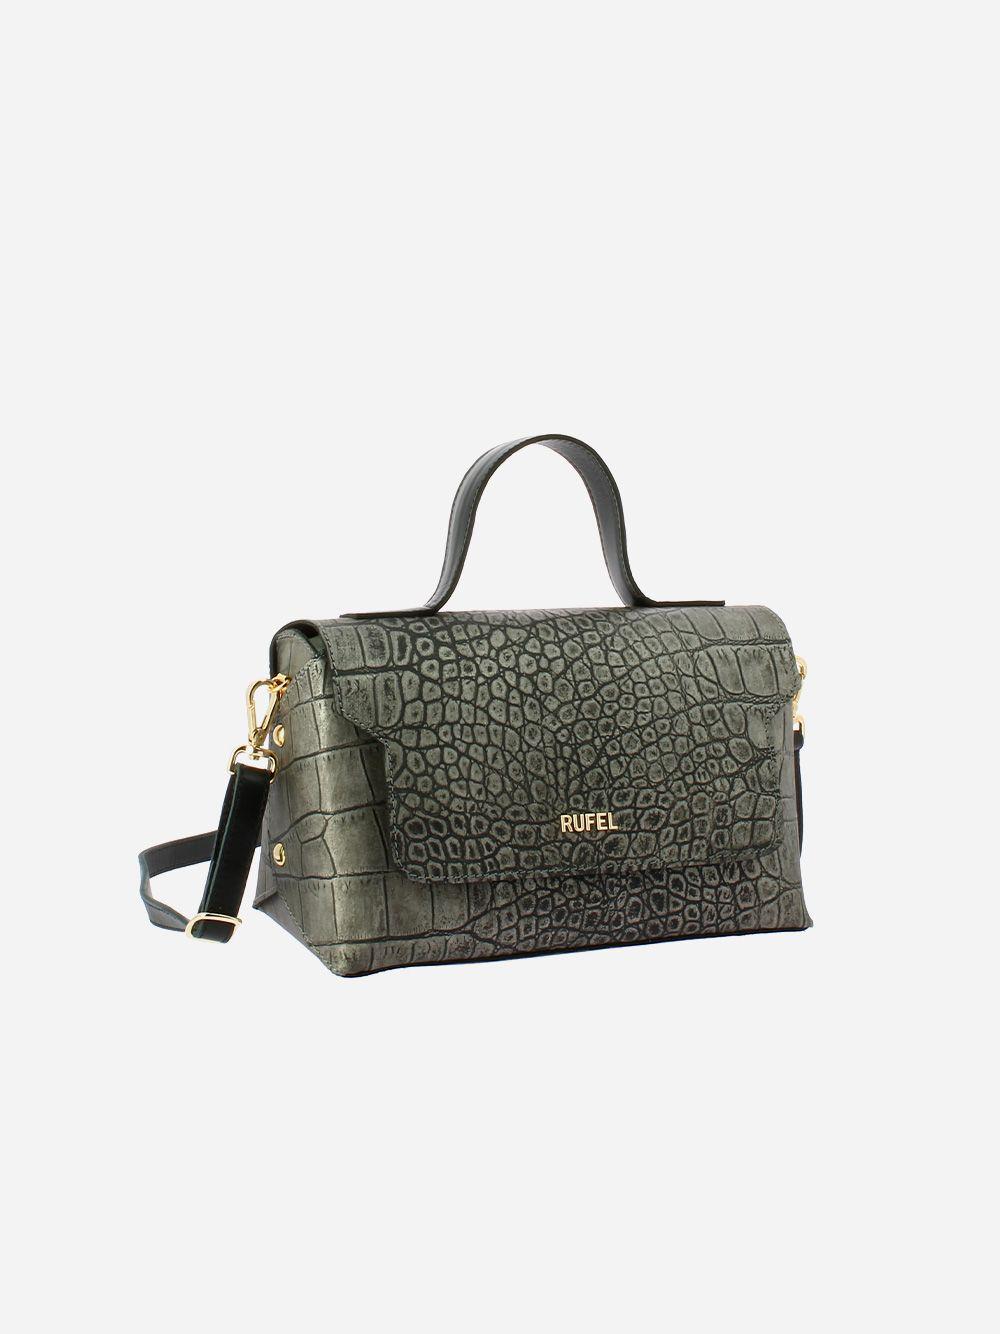 Aidi Black Crossbody Bag | Rufel